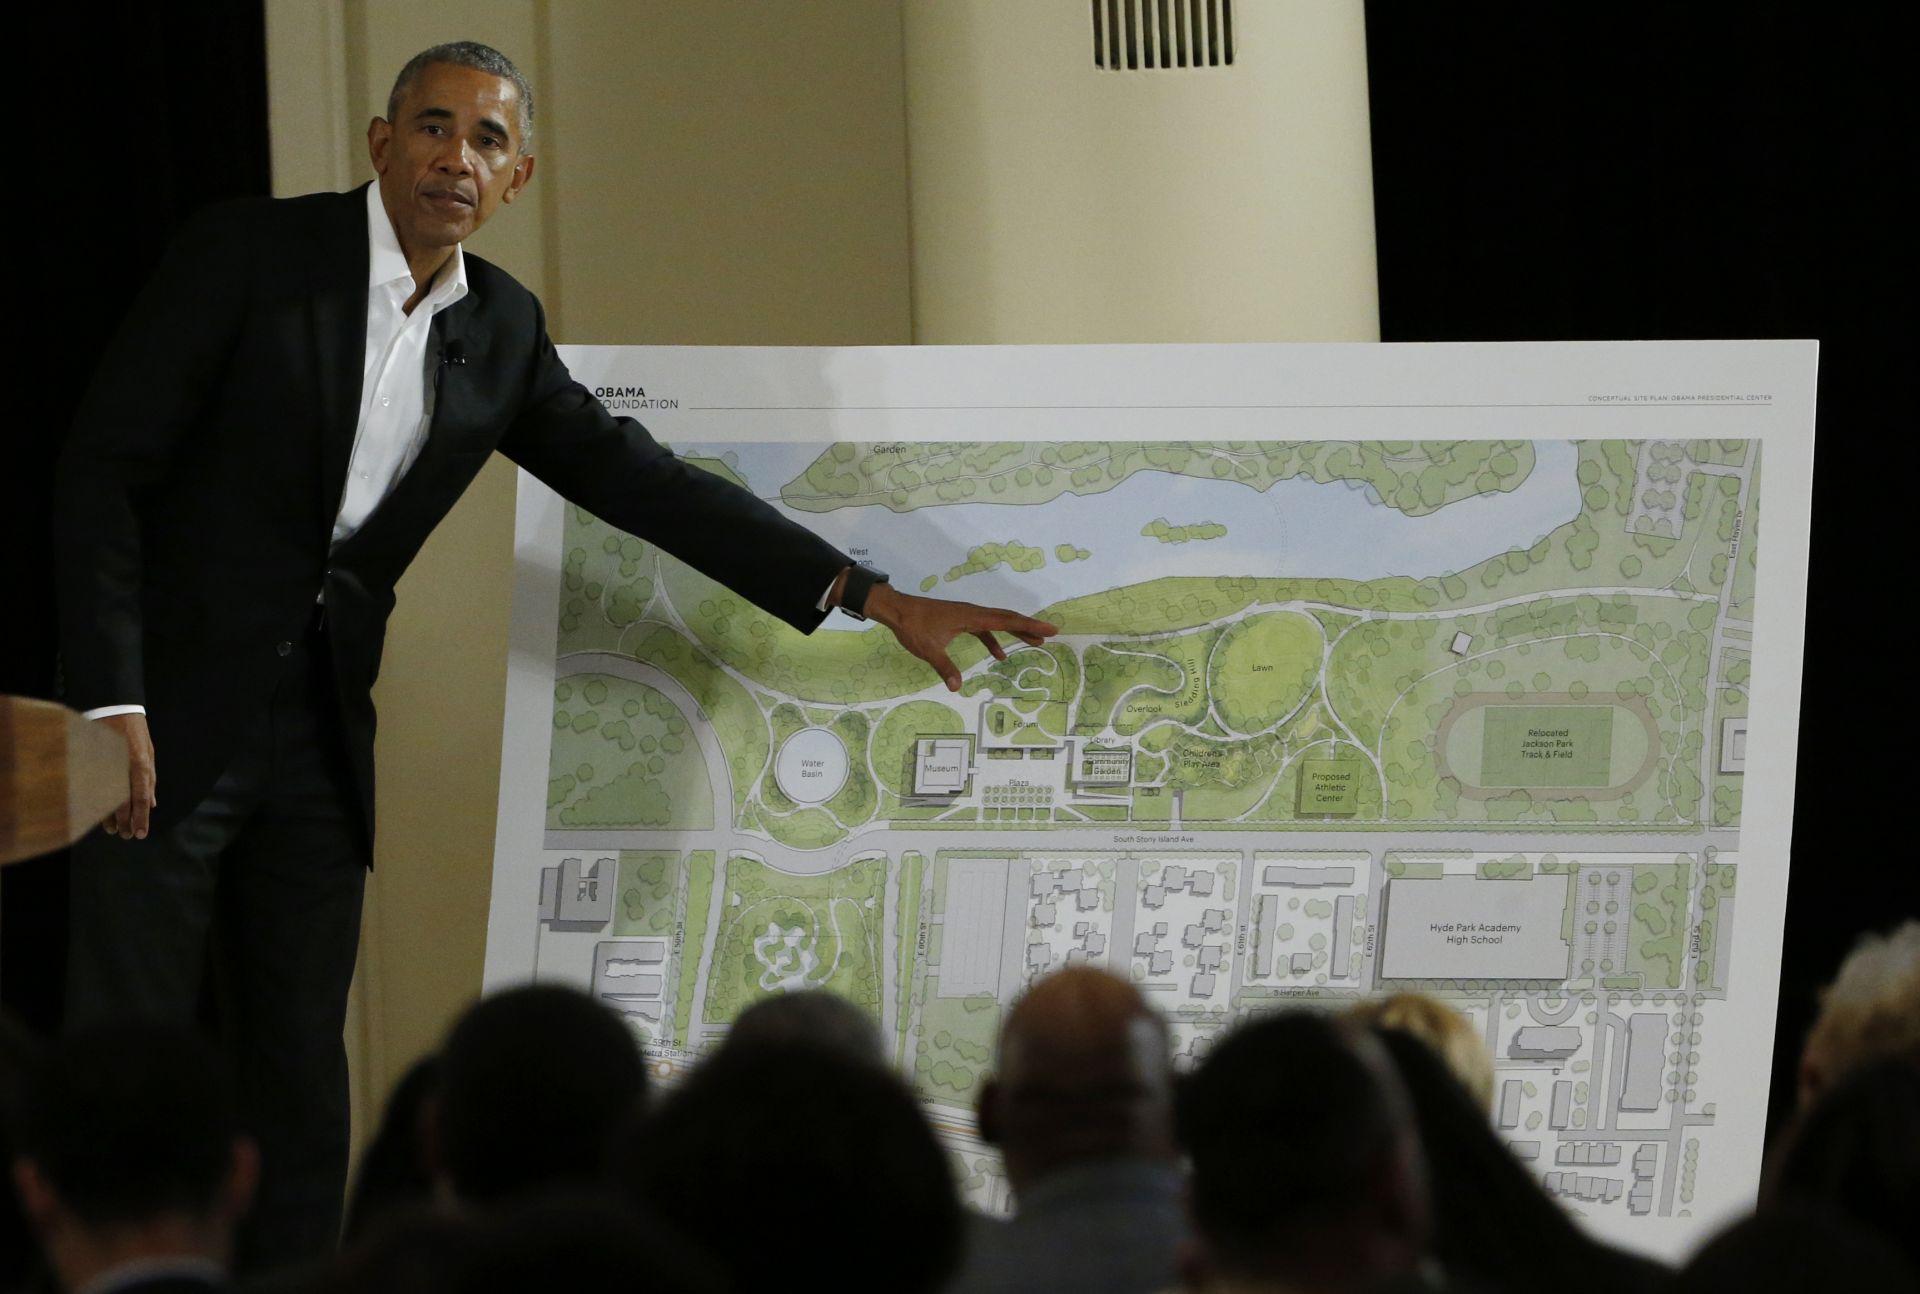 Още през 2017 г. Обама представи своя проект